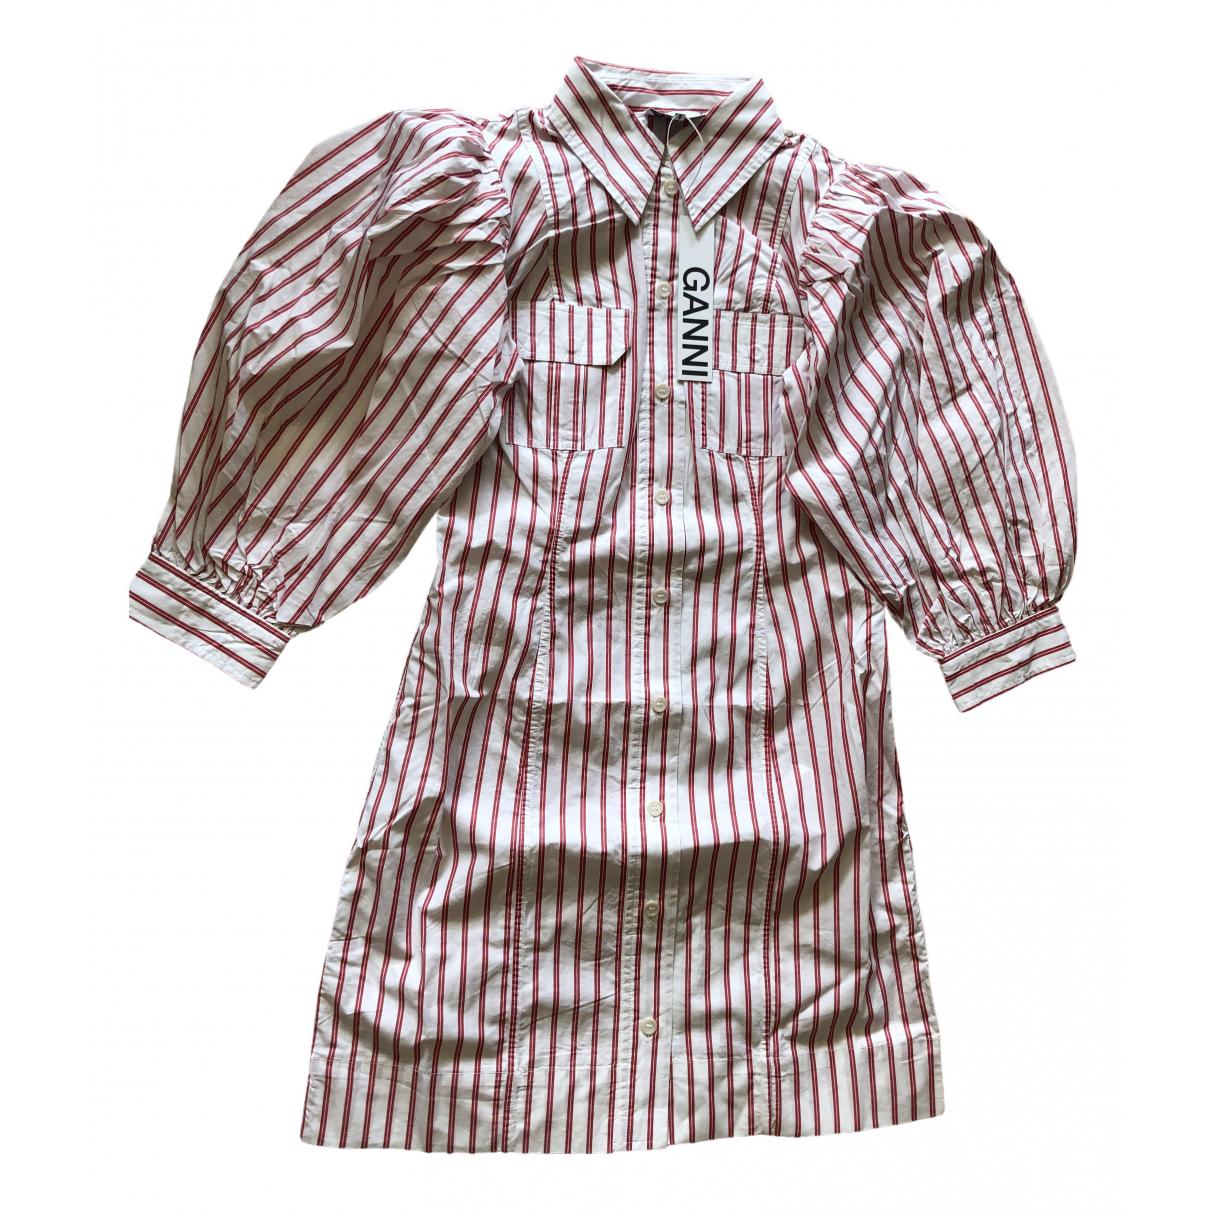 Ganni - Robe Spring Summer 2020 pour femme en coton - blanc